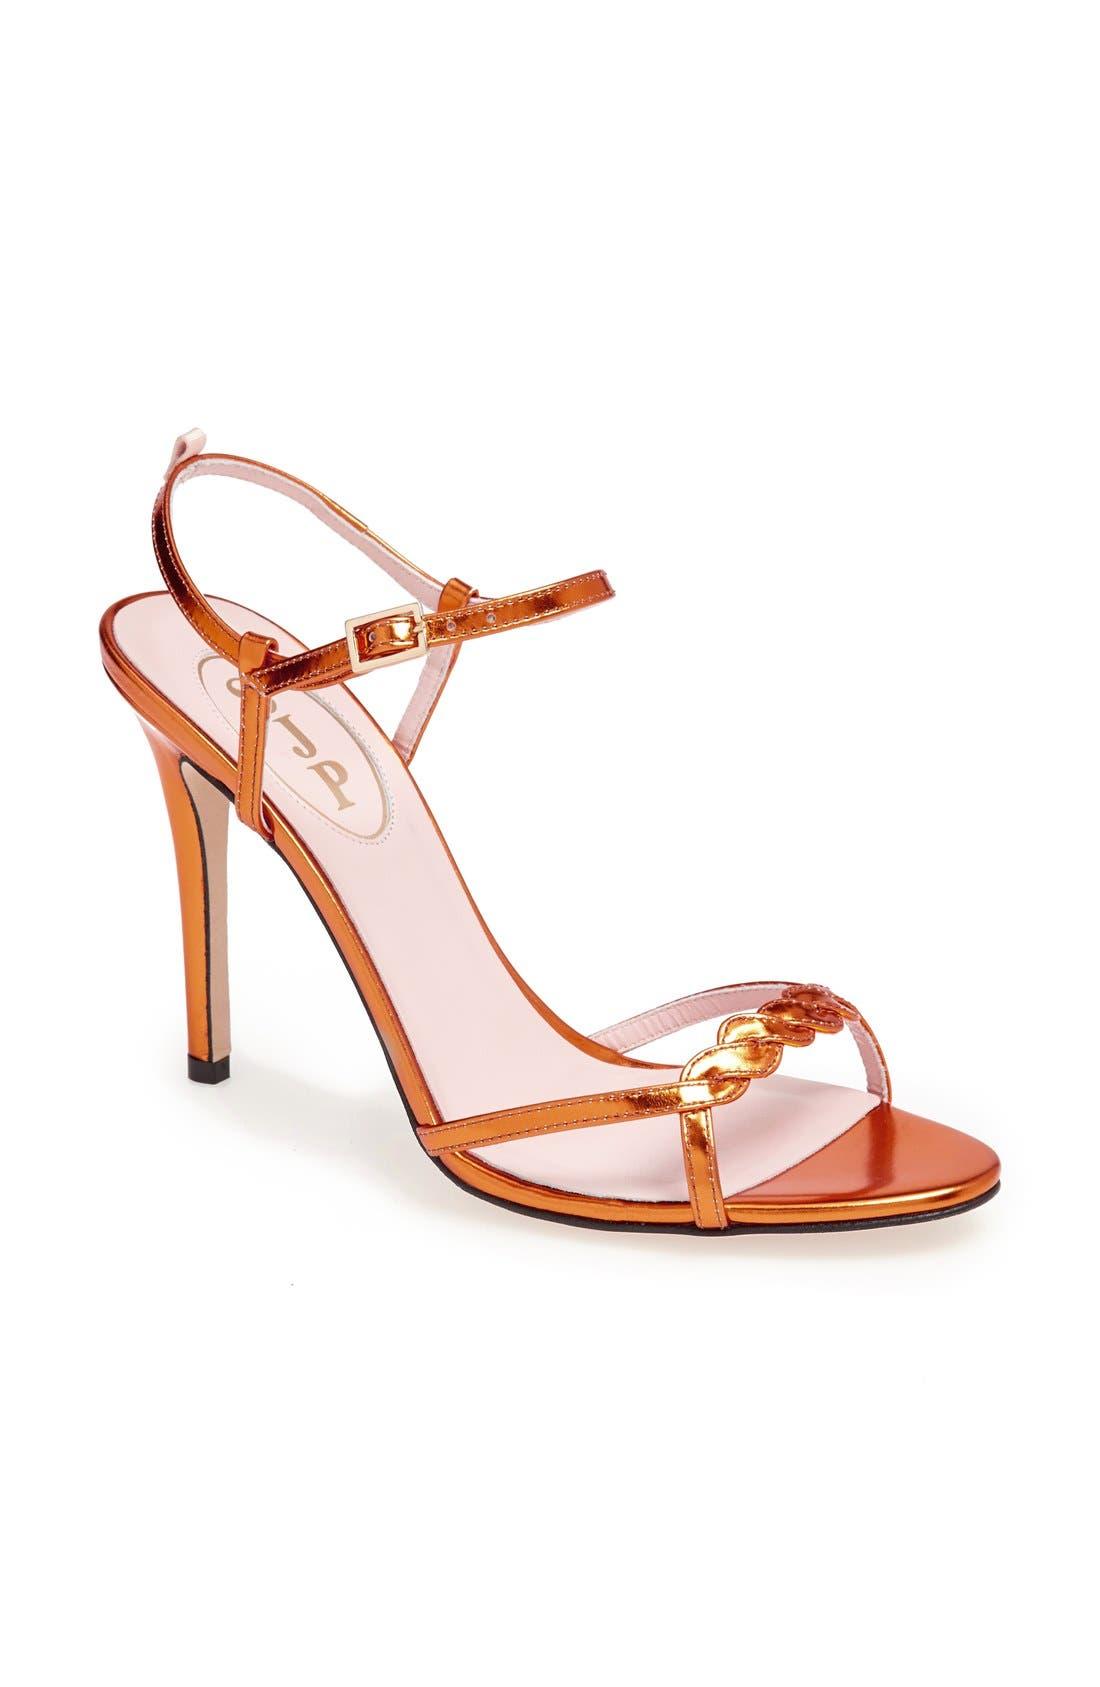 Alternate Image 1 Selected - SJP 'Brigitte' Sandal (Nordstrom Exclusive)